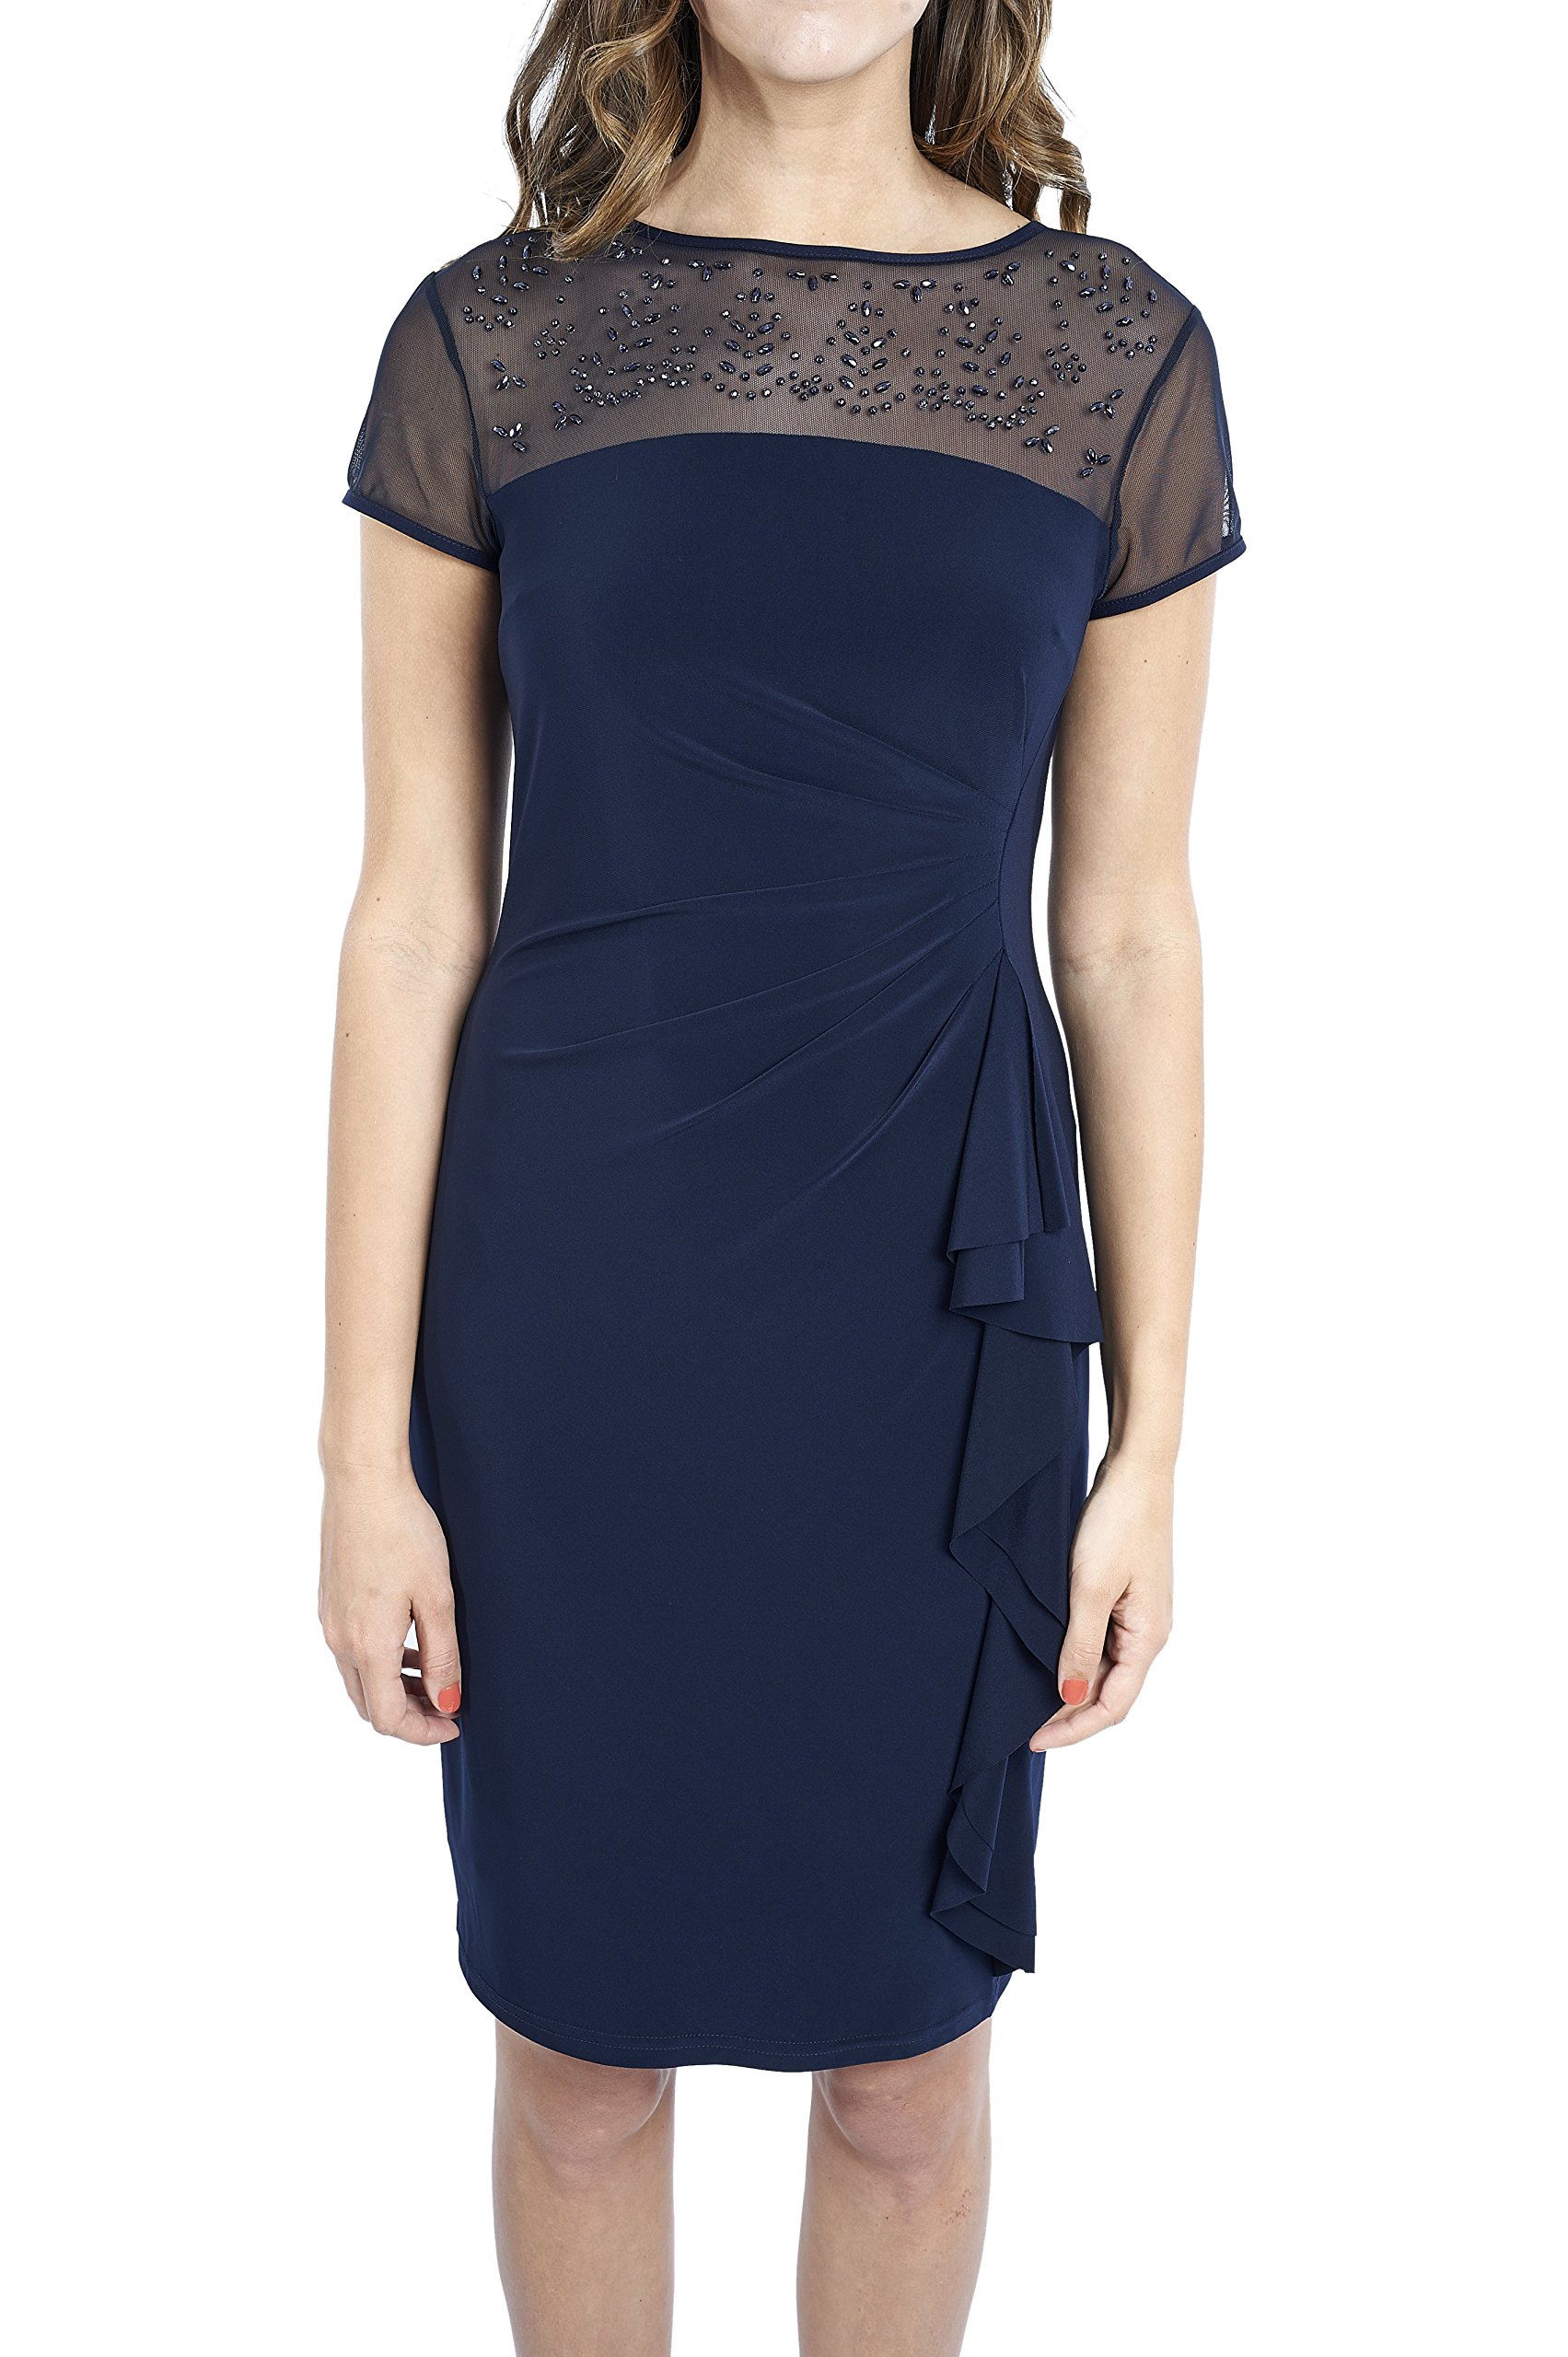 Joseph Ribkoff Midnight Blue Sheer Neck Beaded Cocktail Dress Style 163164 - Size 10